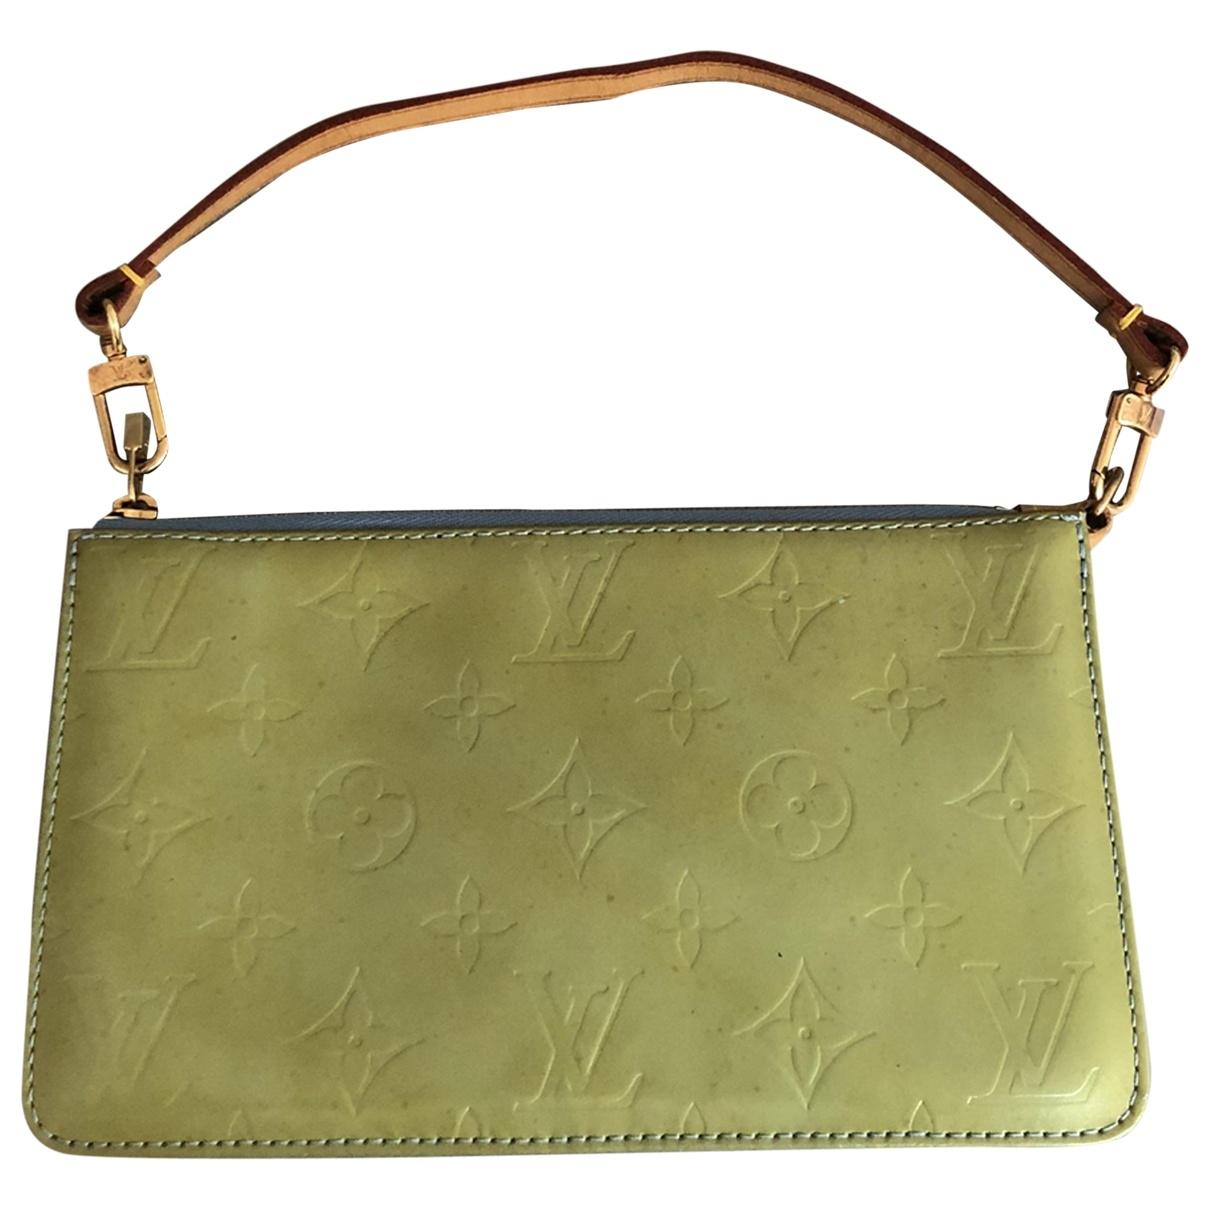 Louis Vuitton - Sac a main   pour femme en cuir verni - vert